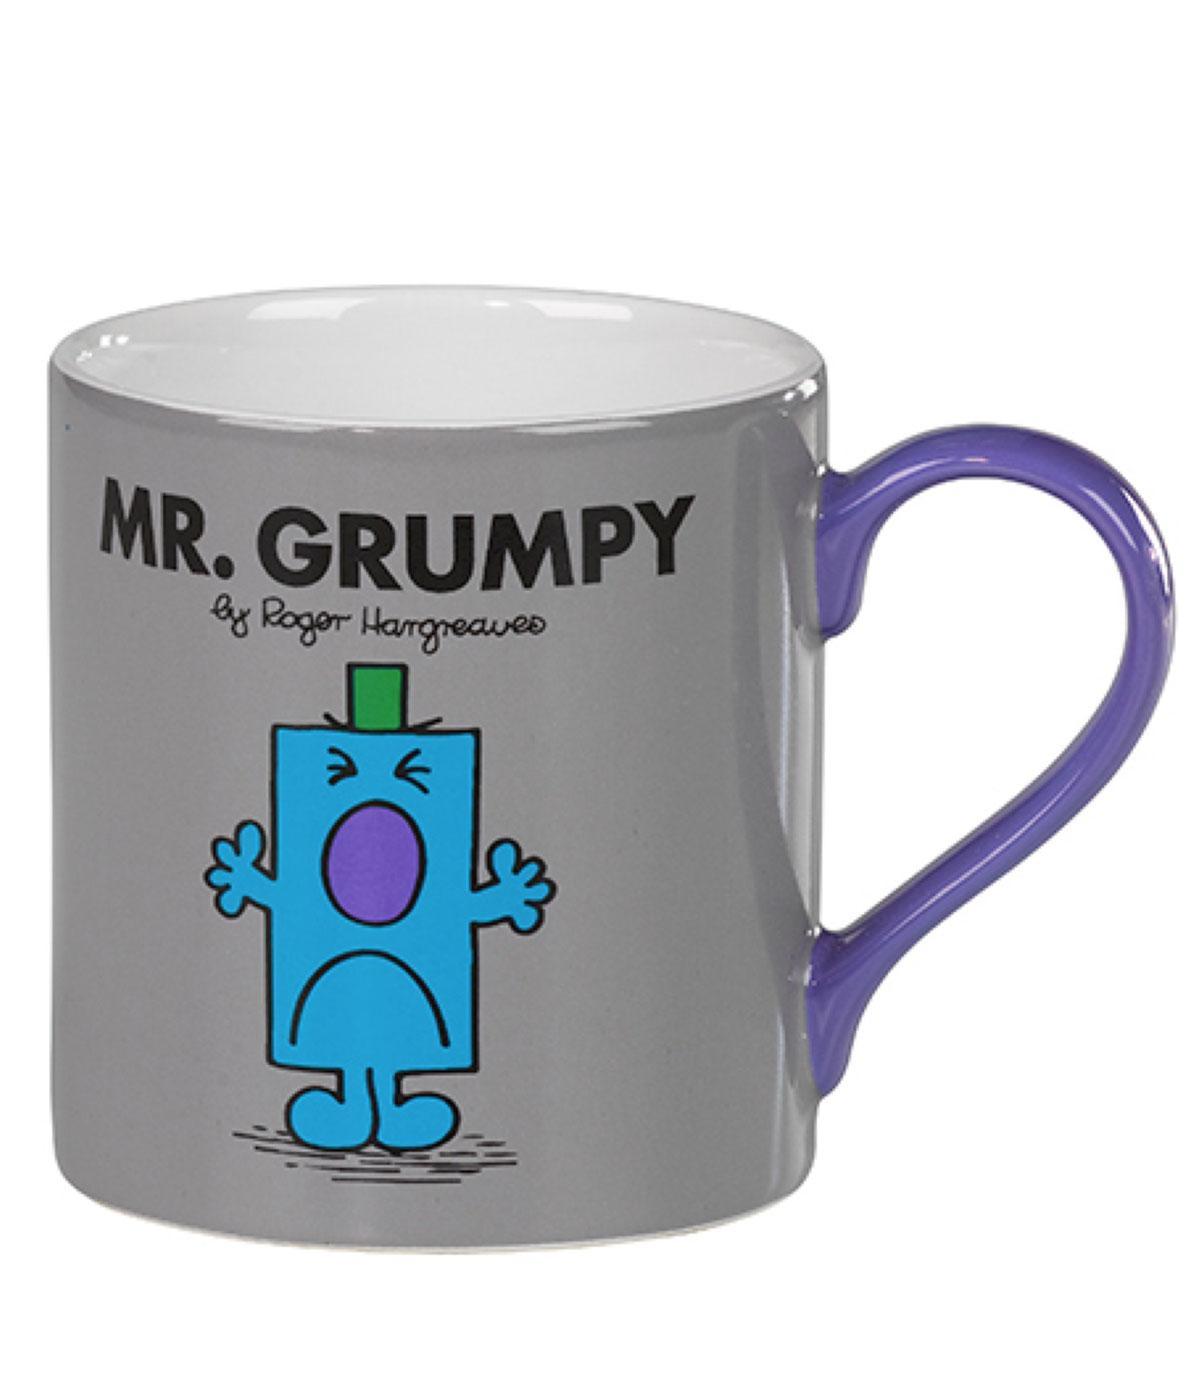 Mr Grumpy - Retro Mr Men and Little Miss Mug